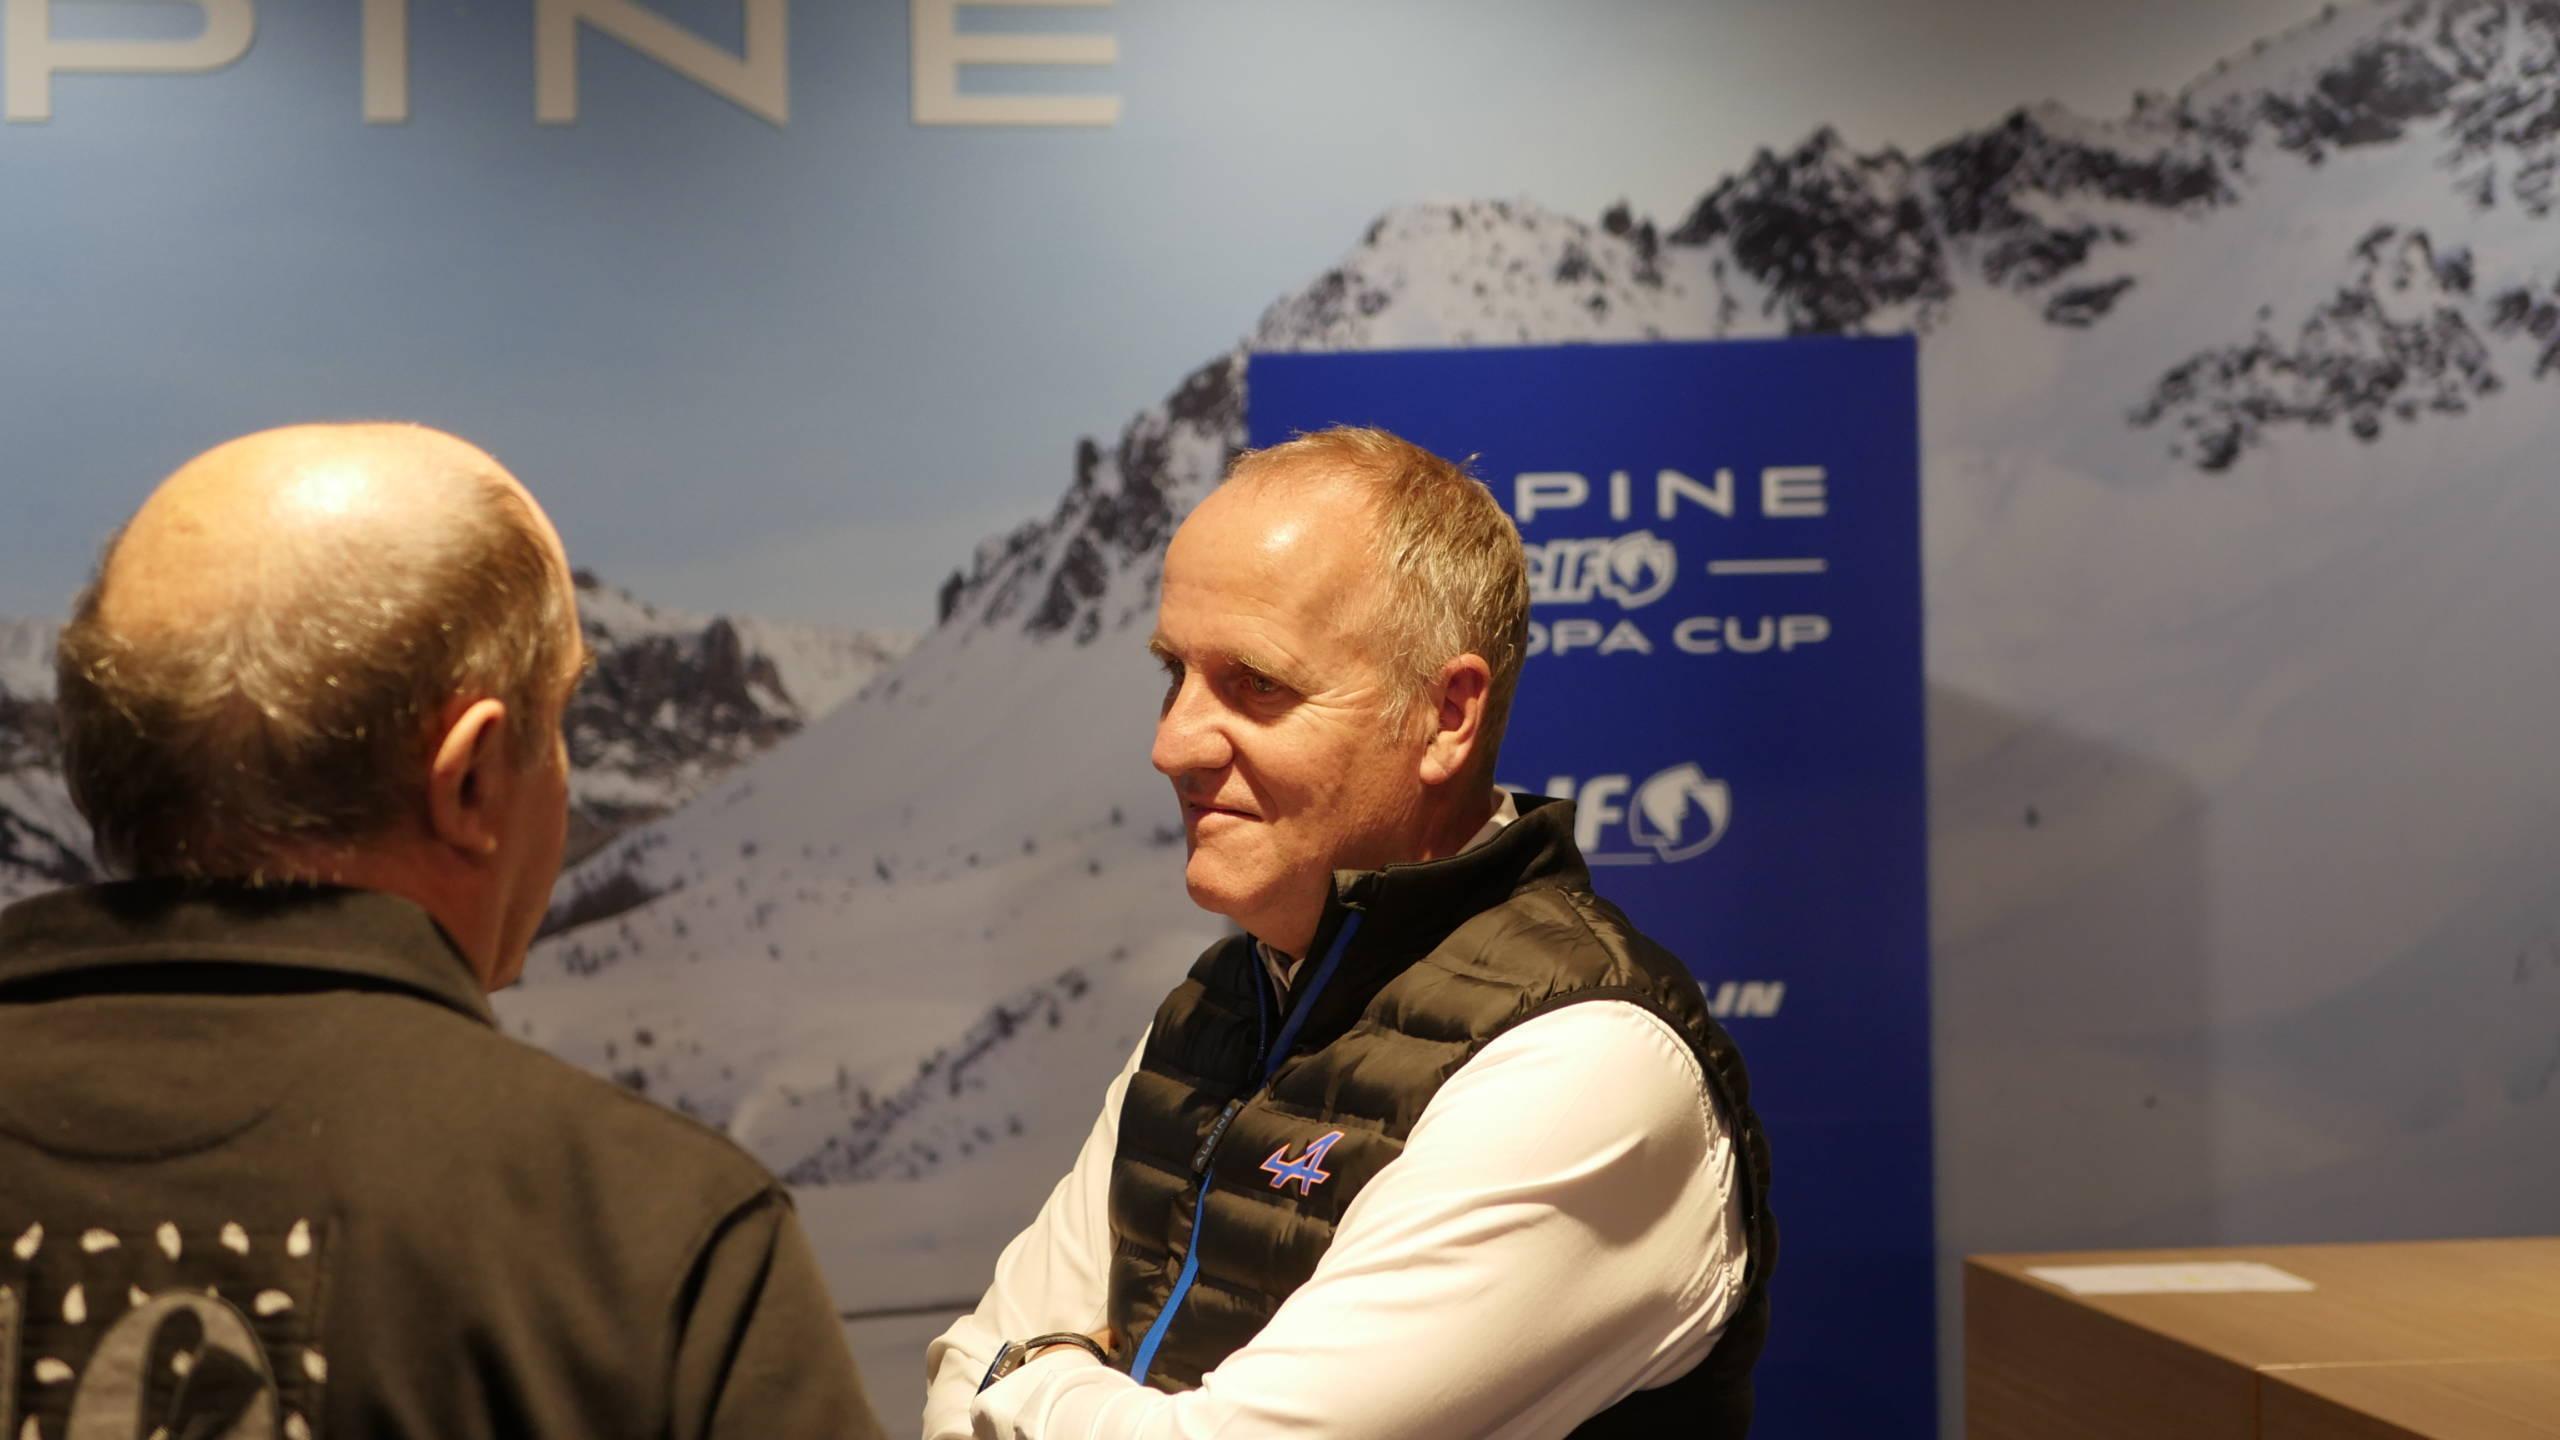 Soirée Alpine Elf Europa Cup 2018 récompense Showroom CMR 30 | Alpine Elf Europa Cup: par ici le programme 2019 !